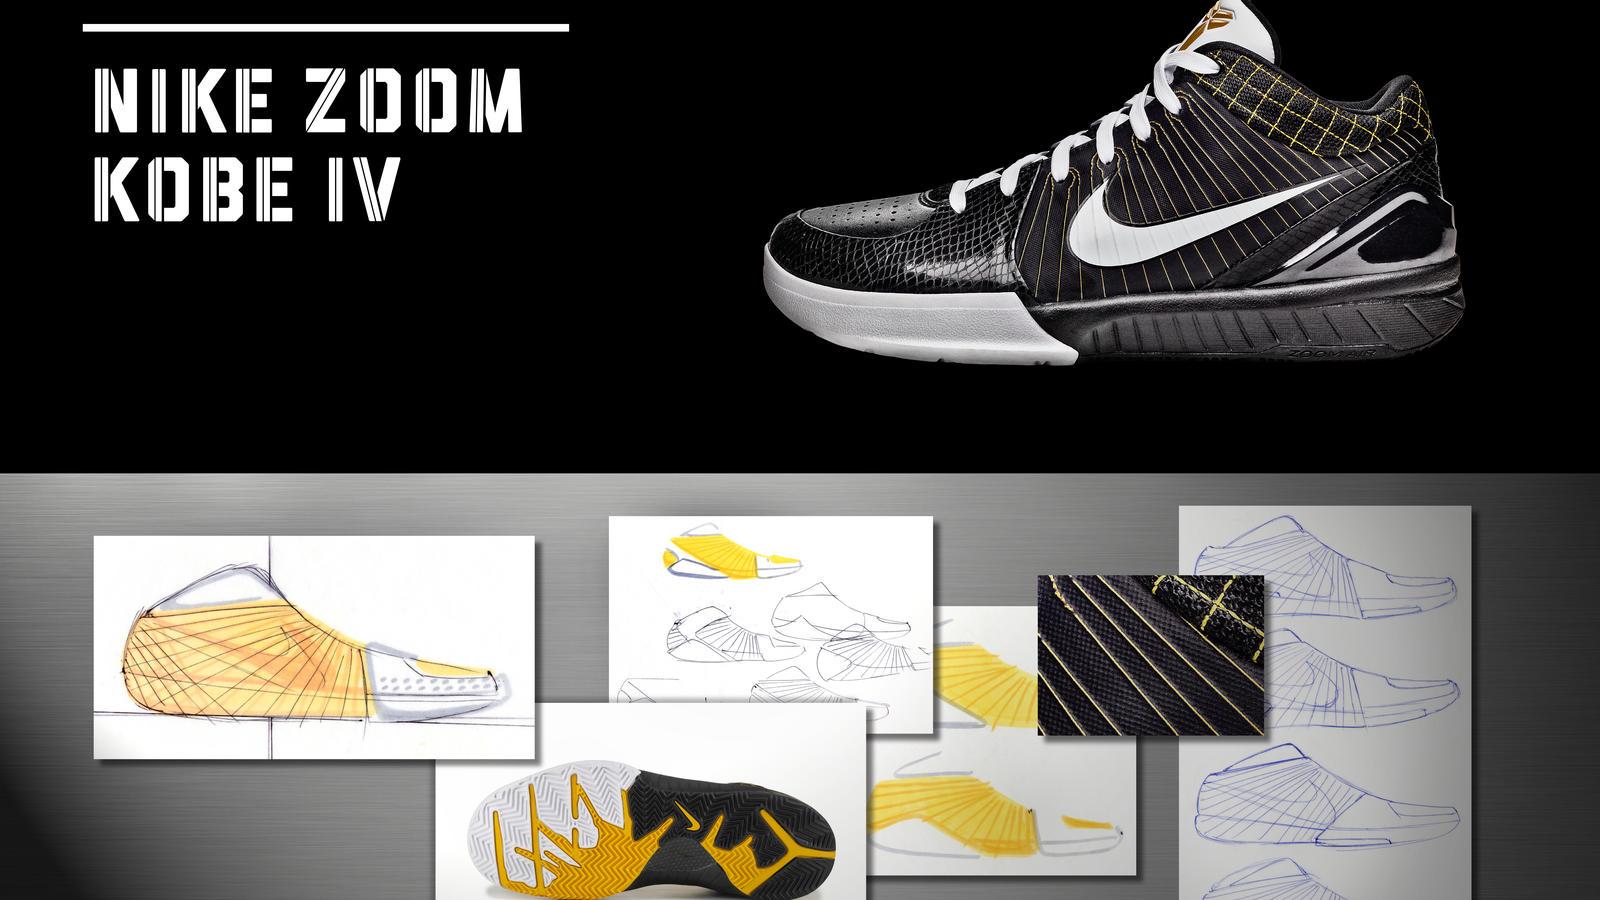 buy popular 36bfe 12353 Nike Zoom Kobe IV - Nike News